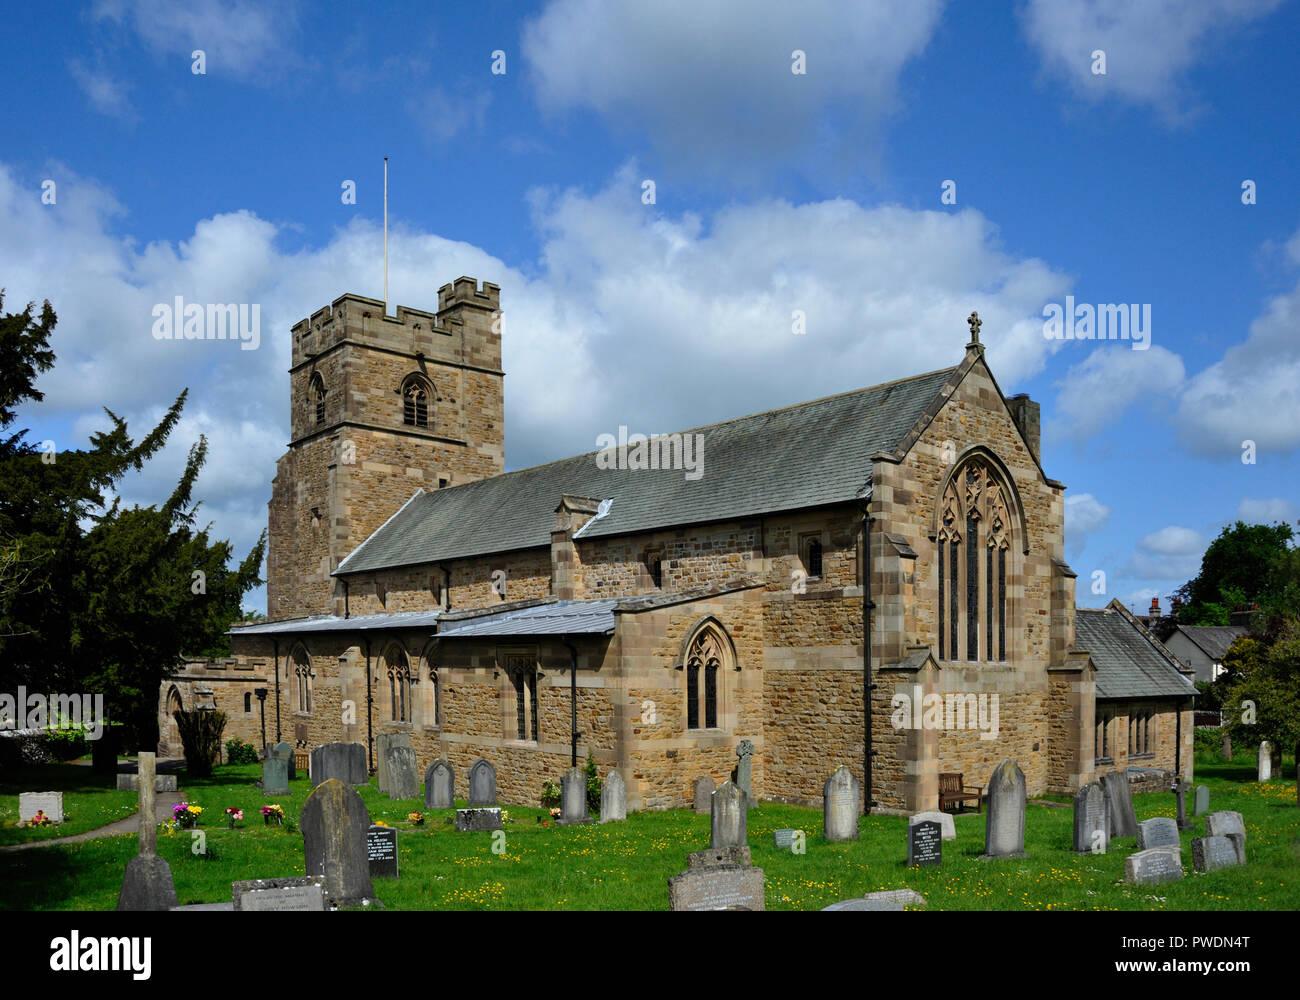 Church of Saint Mark, Natland, Cumbria, England, United Kingdom, Europe. - Stock Image